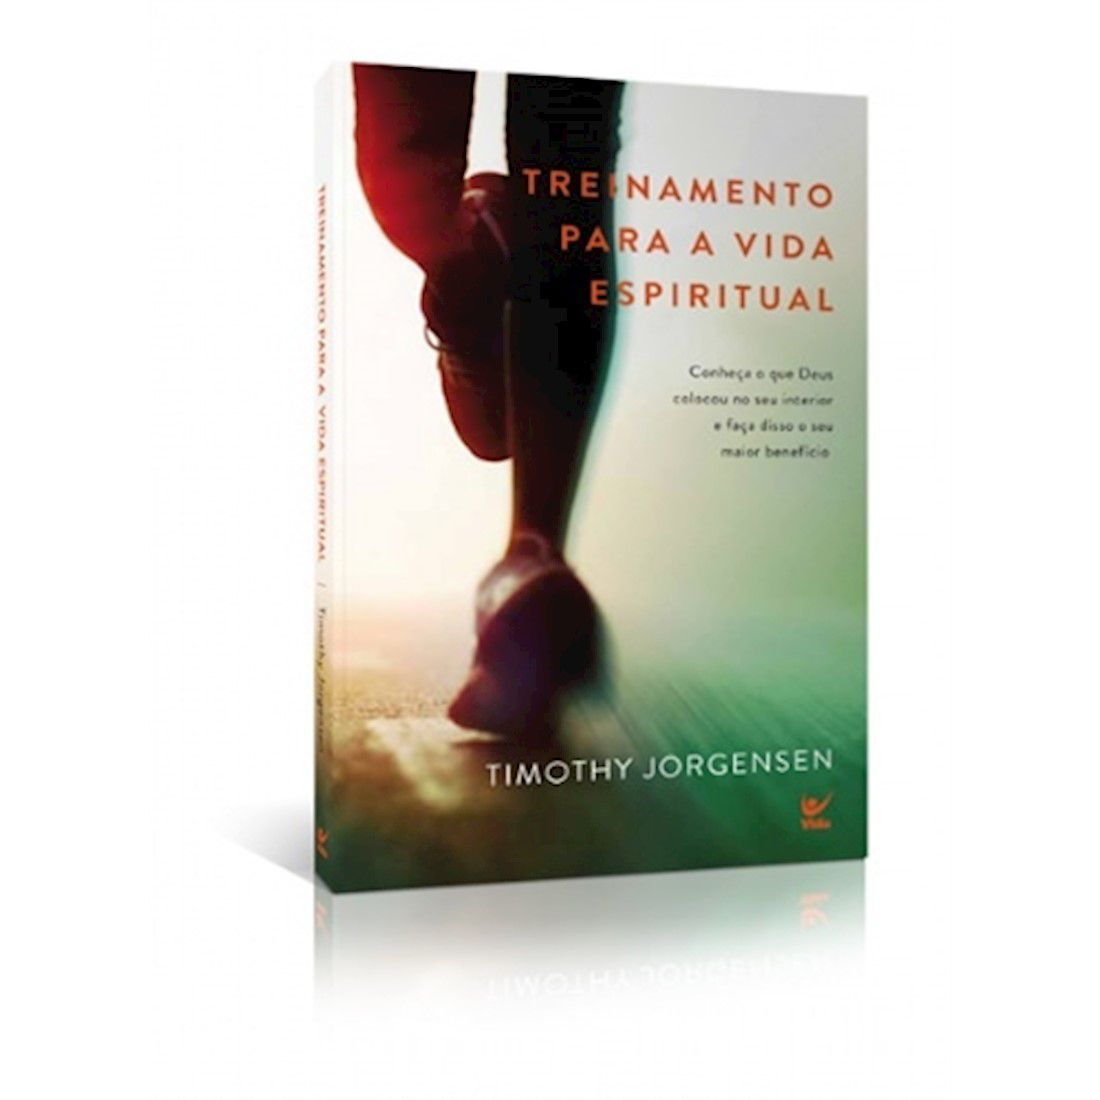 Livro Treinamento Para A Vida Espiritual